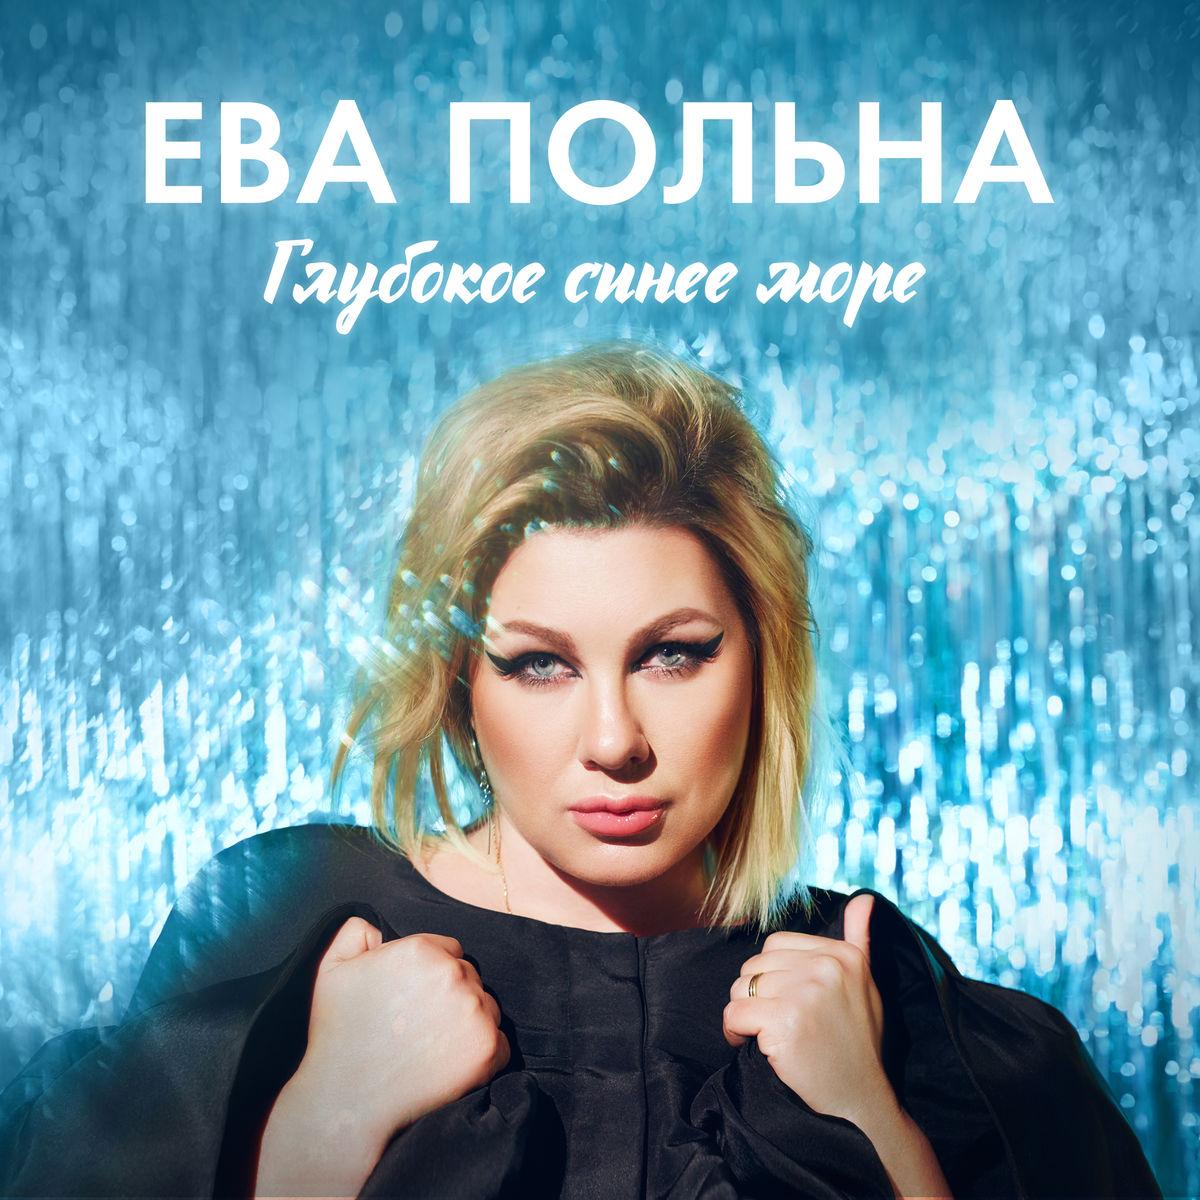 Ева Польна - Глубокое синее море, 2017 - слушать онлайн